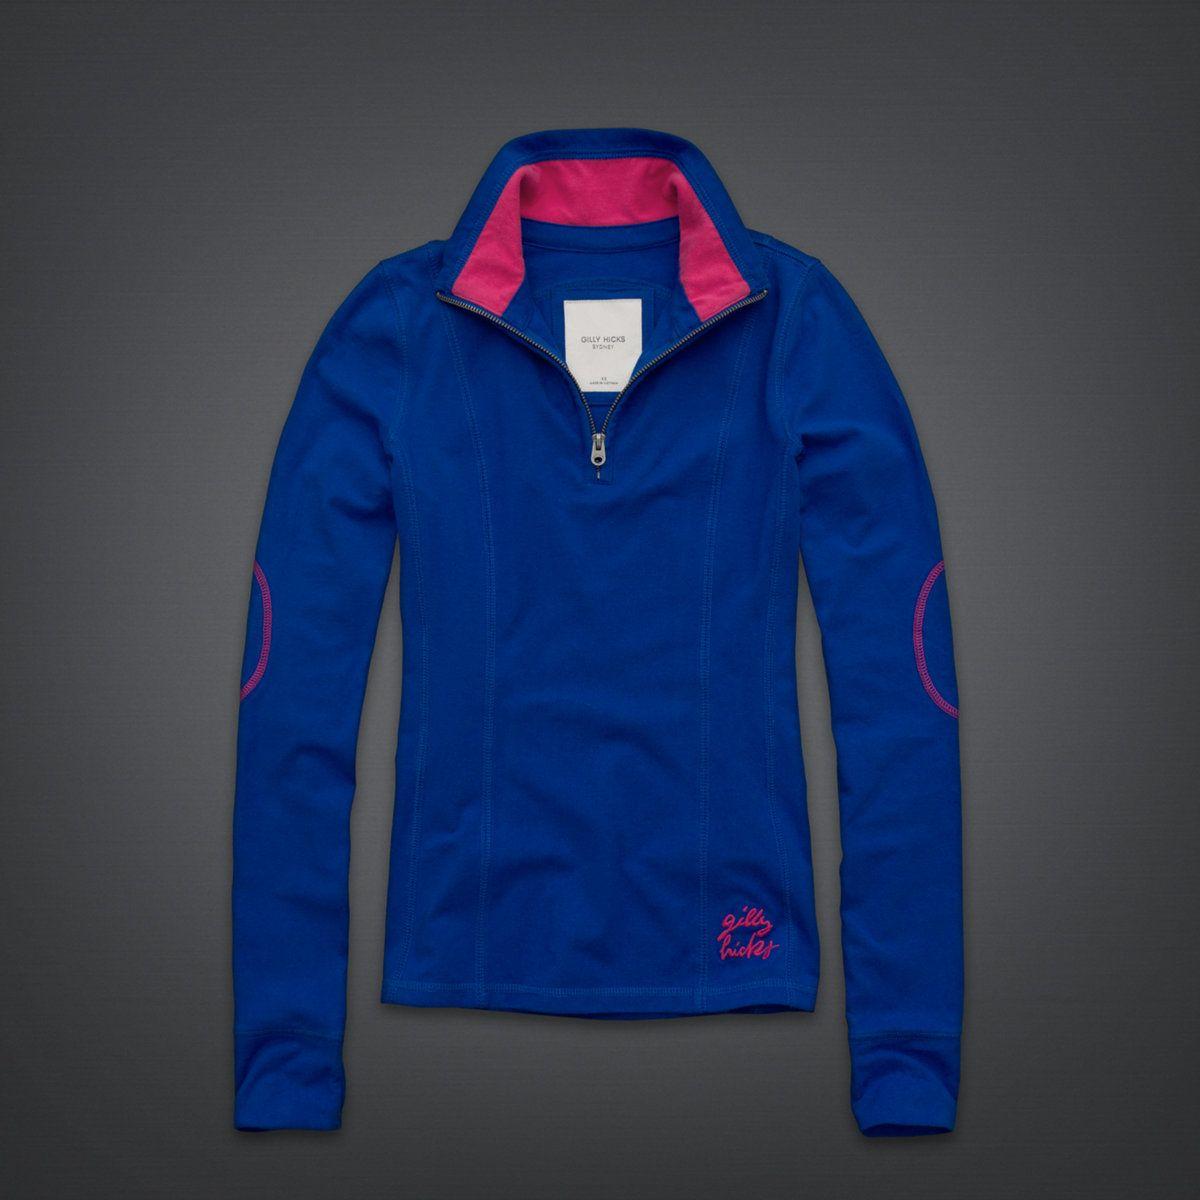 Womens Denistone Sweatshirt | Womens Clothing | GillyHicks.com